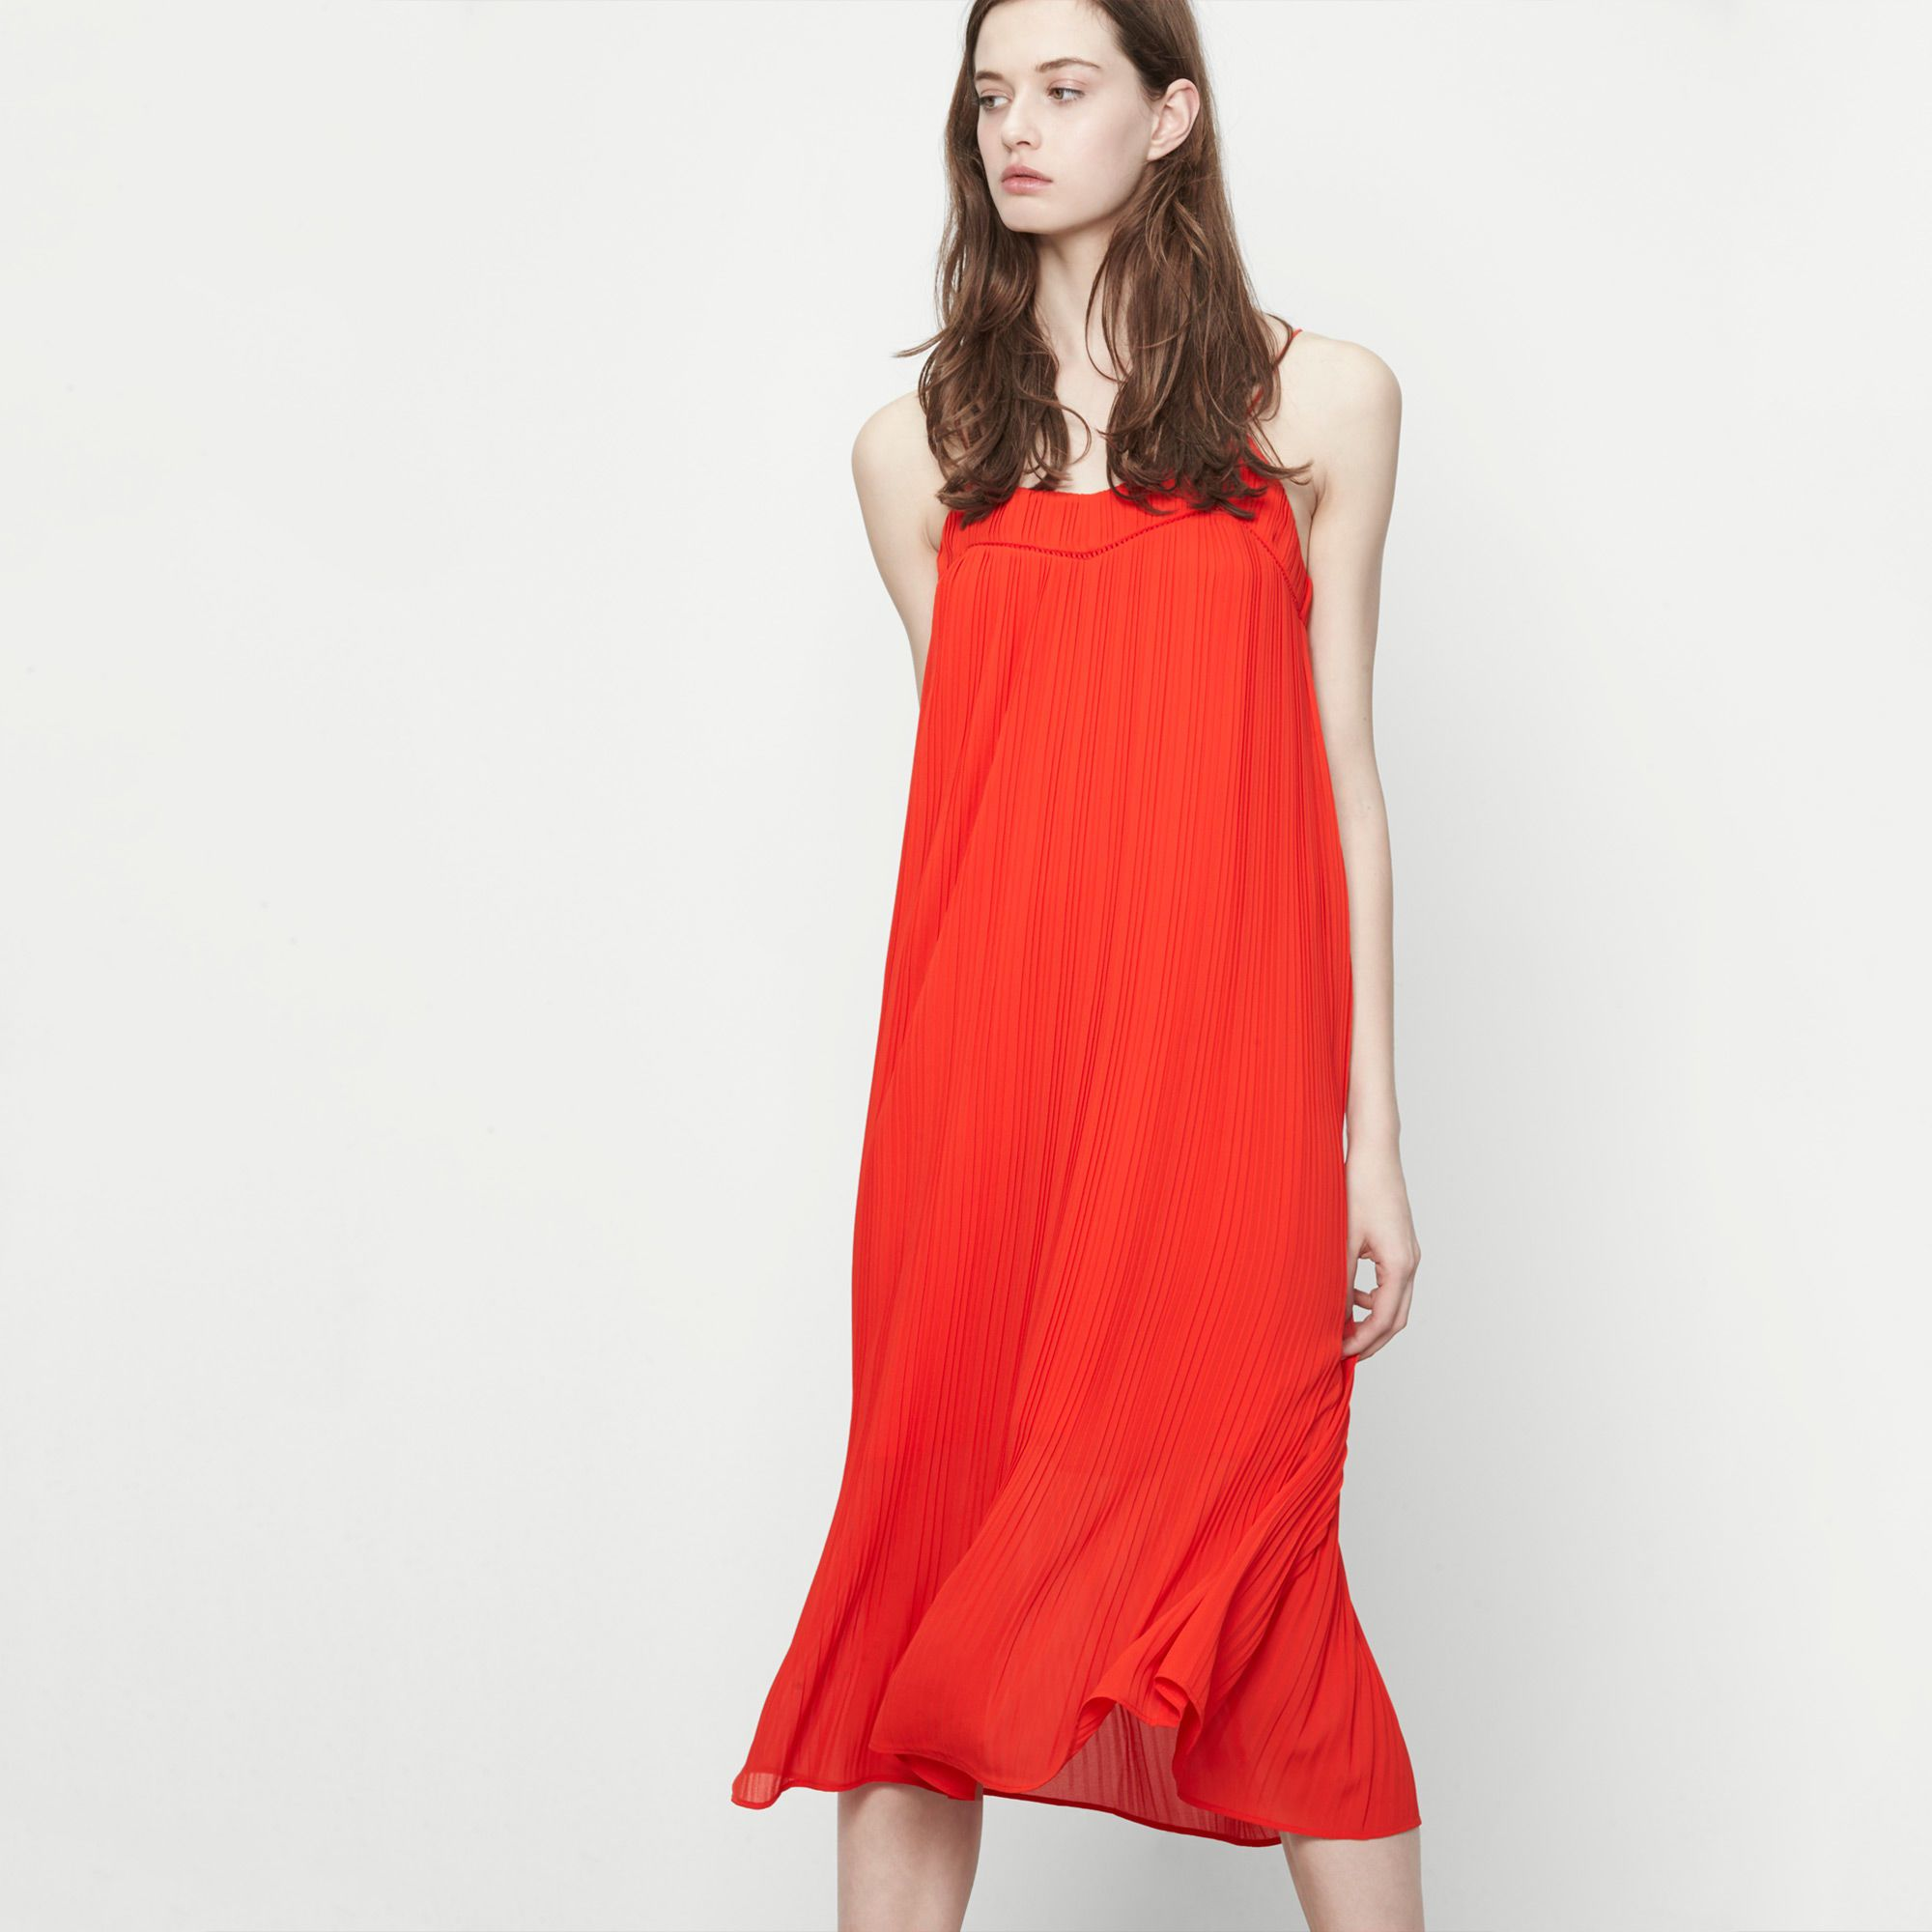 Robe longue rouge plissee